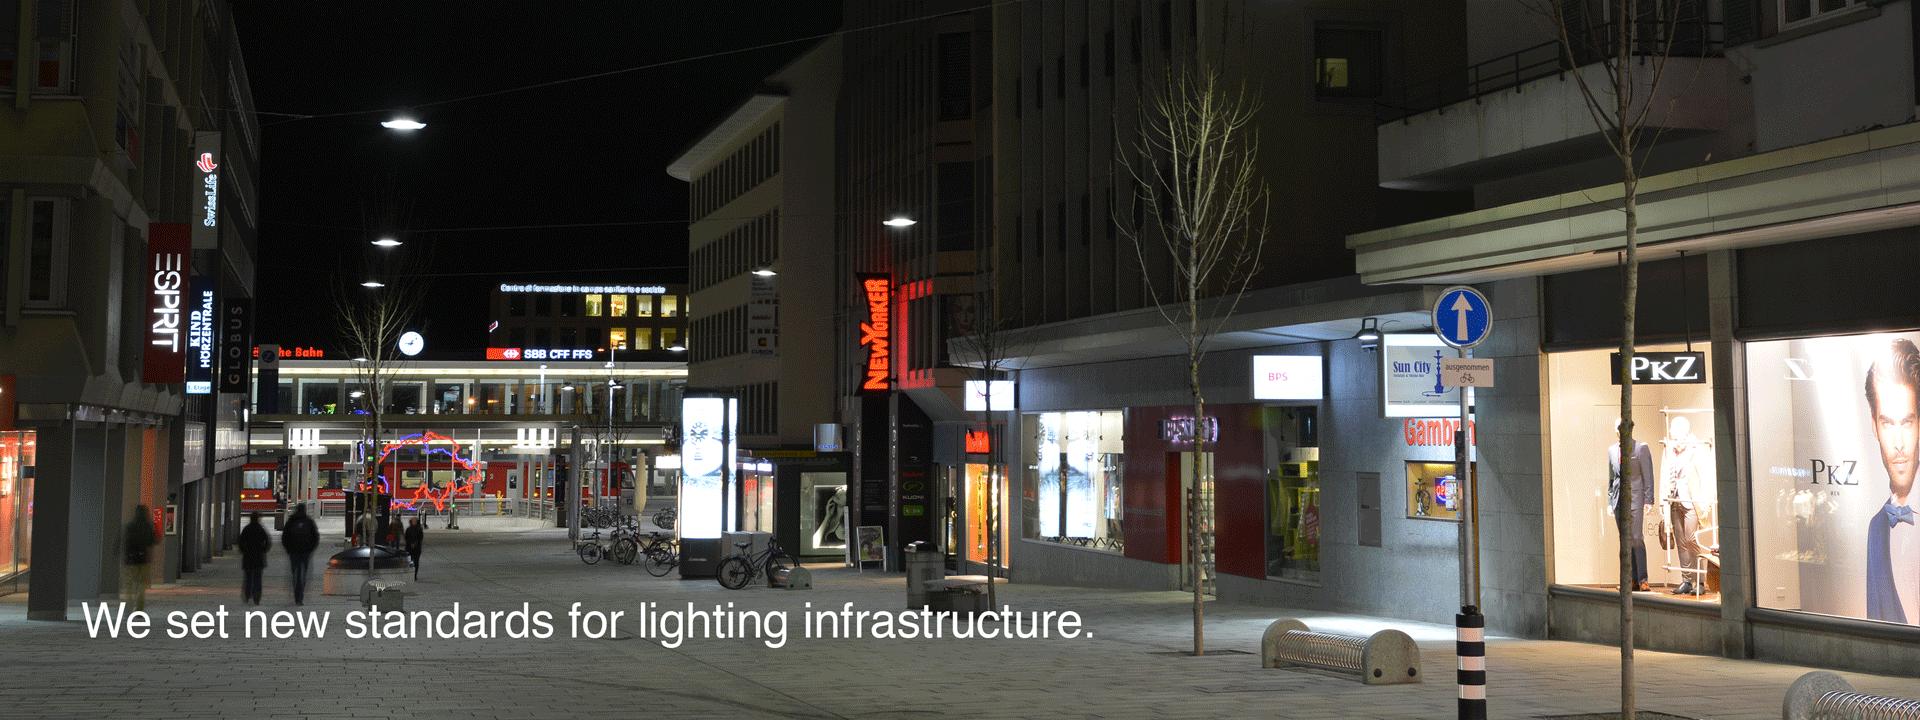 New standards for lighting Infrastructure